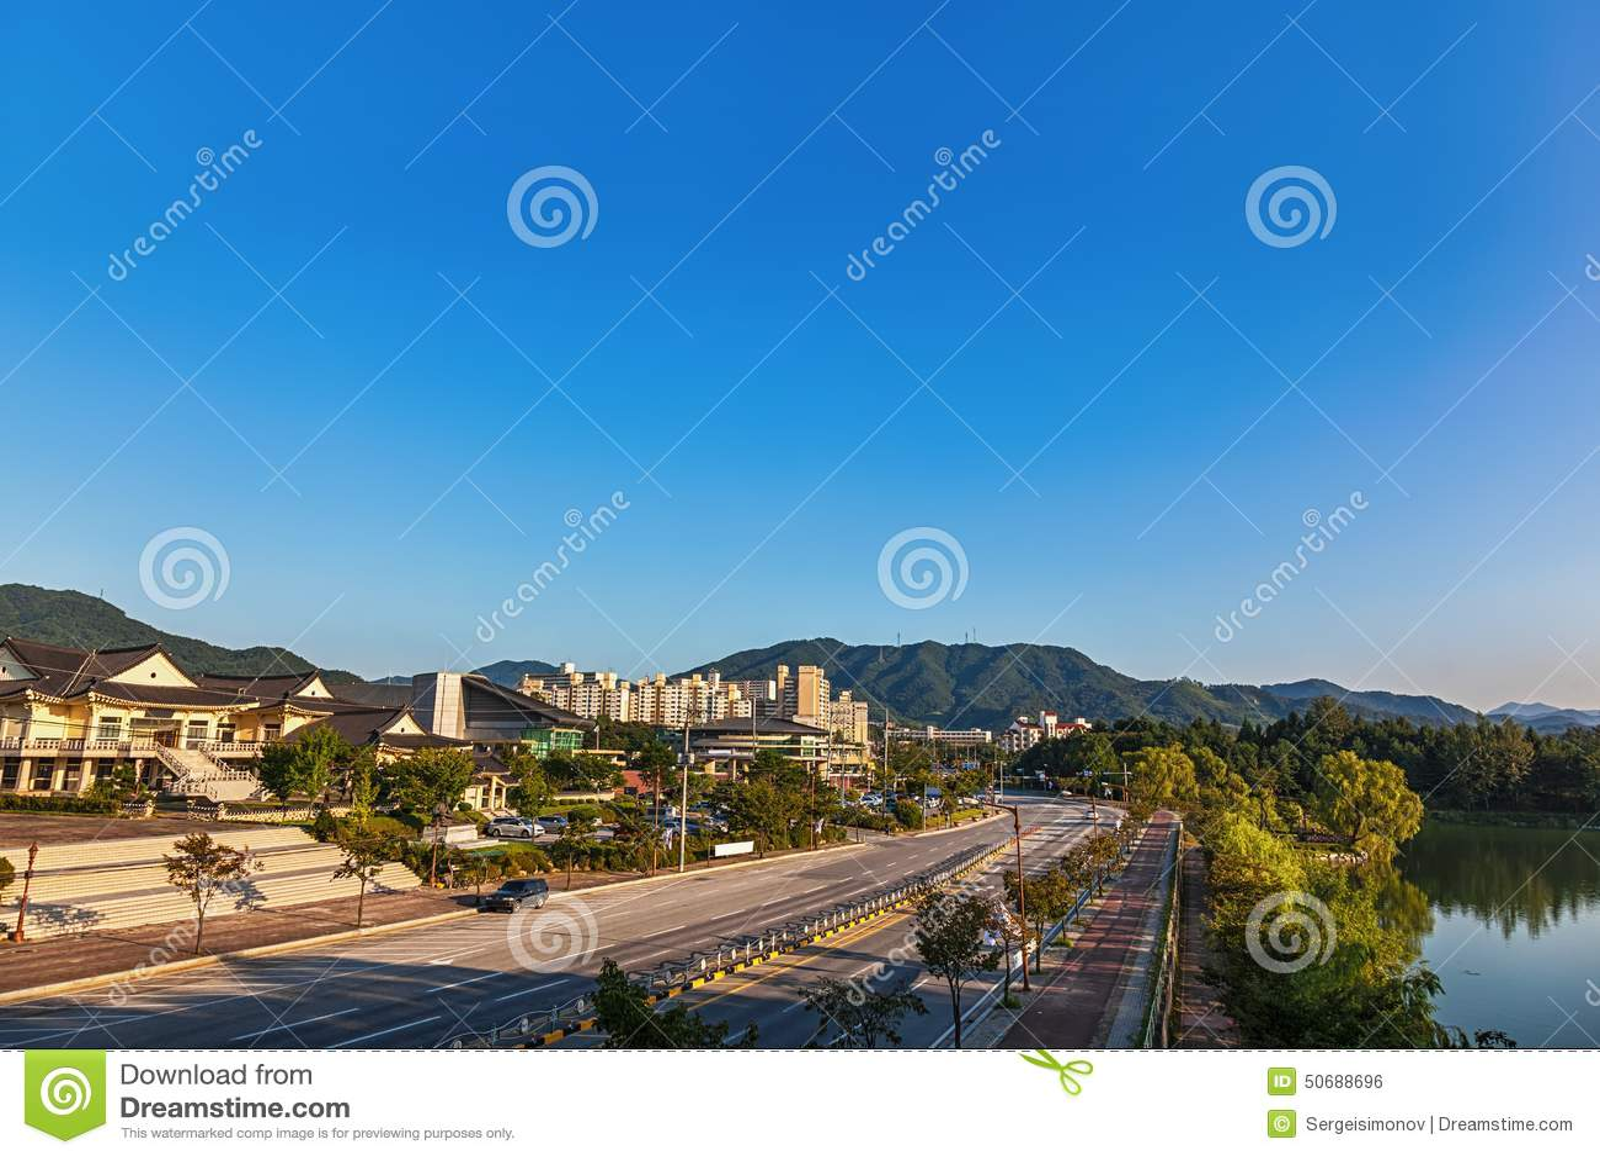 Download 忠州市市都市风景在韩国 库存照片. 图片 包括有 街市, 韩国, 聚会所, 传统, 旅行, 街道, 中央 - 50688696